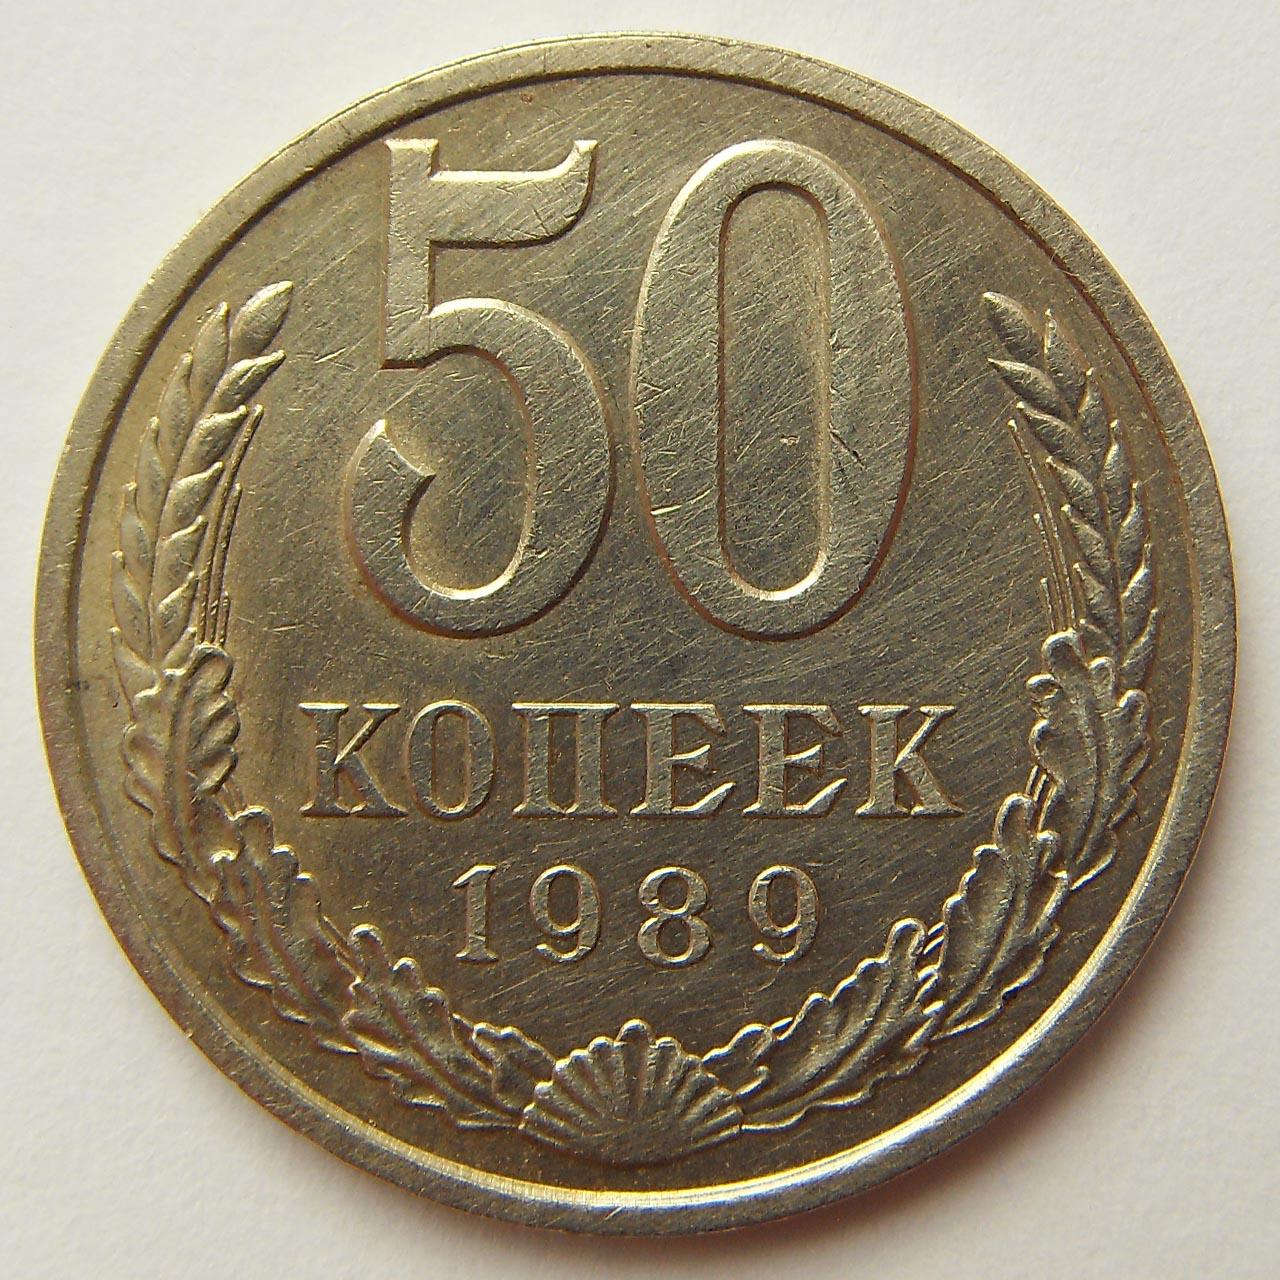 Советские 50 копеек 50 cent eesti vabariik 1936 цена